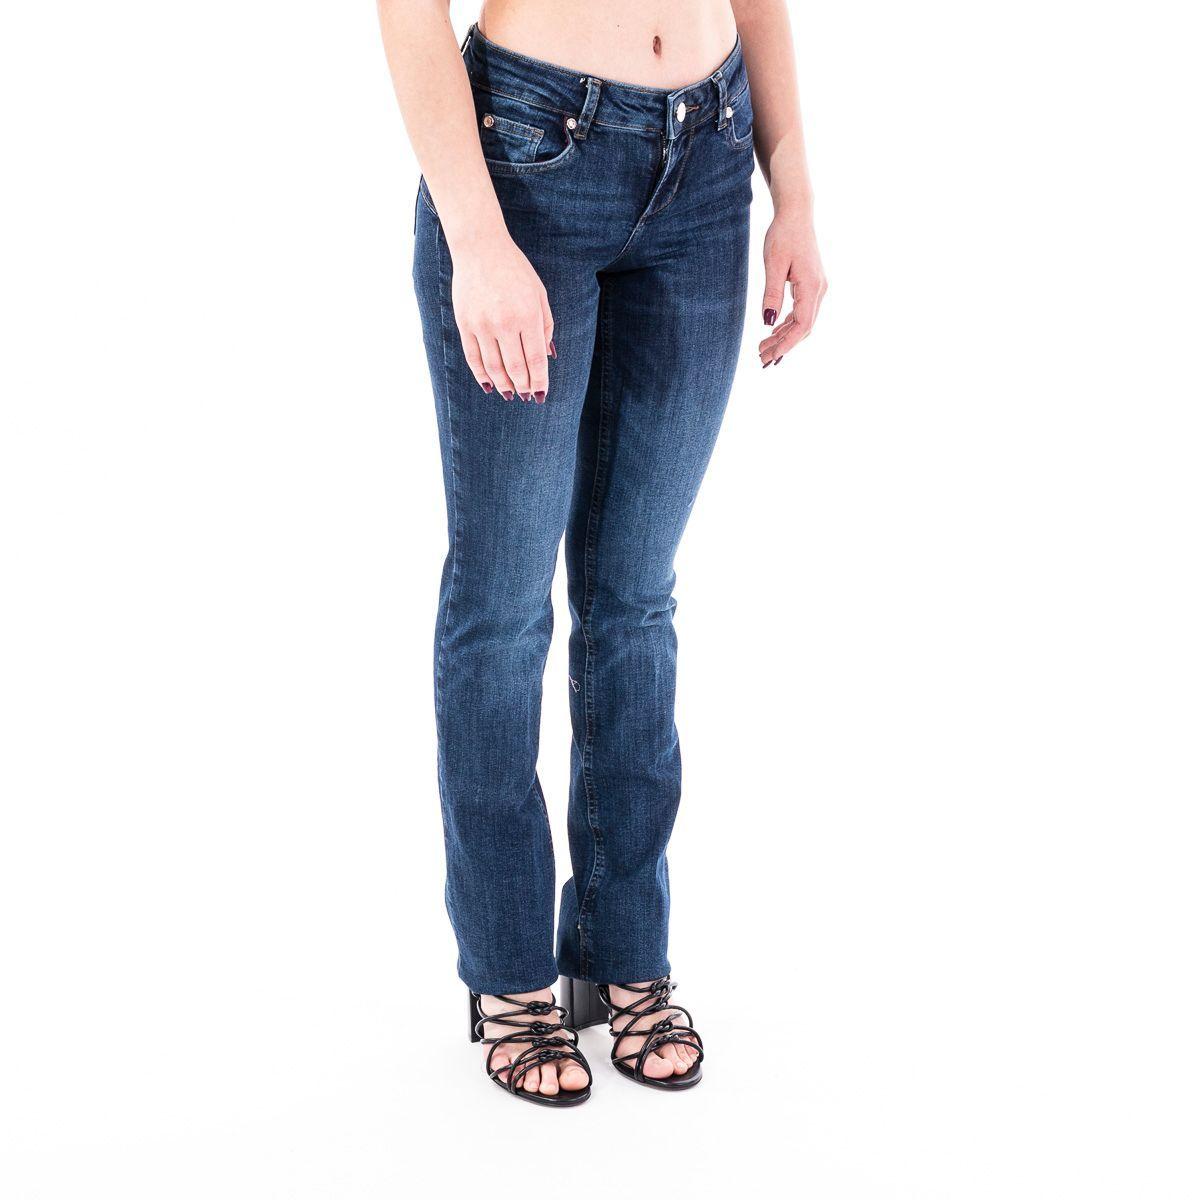 LIU JO WOMEN'S UA0025D412777411 BLUE COTTON JEANS